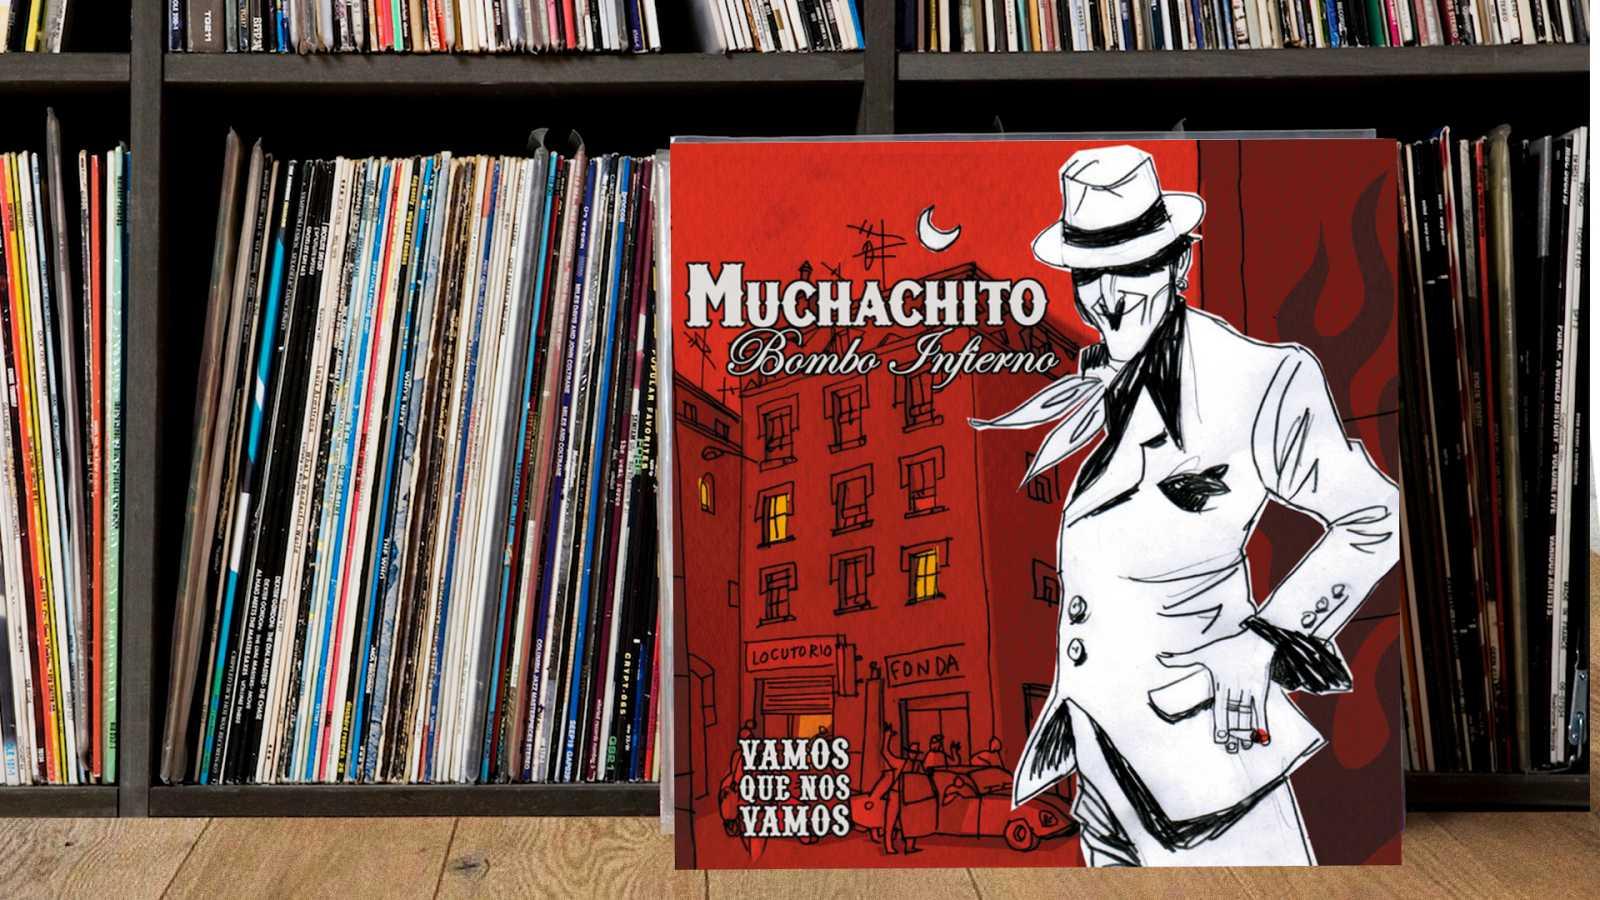 Doce Pulgadas - Muchachito Bombo Infierno (I) - 14/10/21 - Escuchar ahora